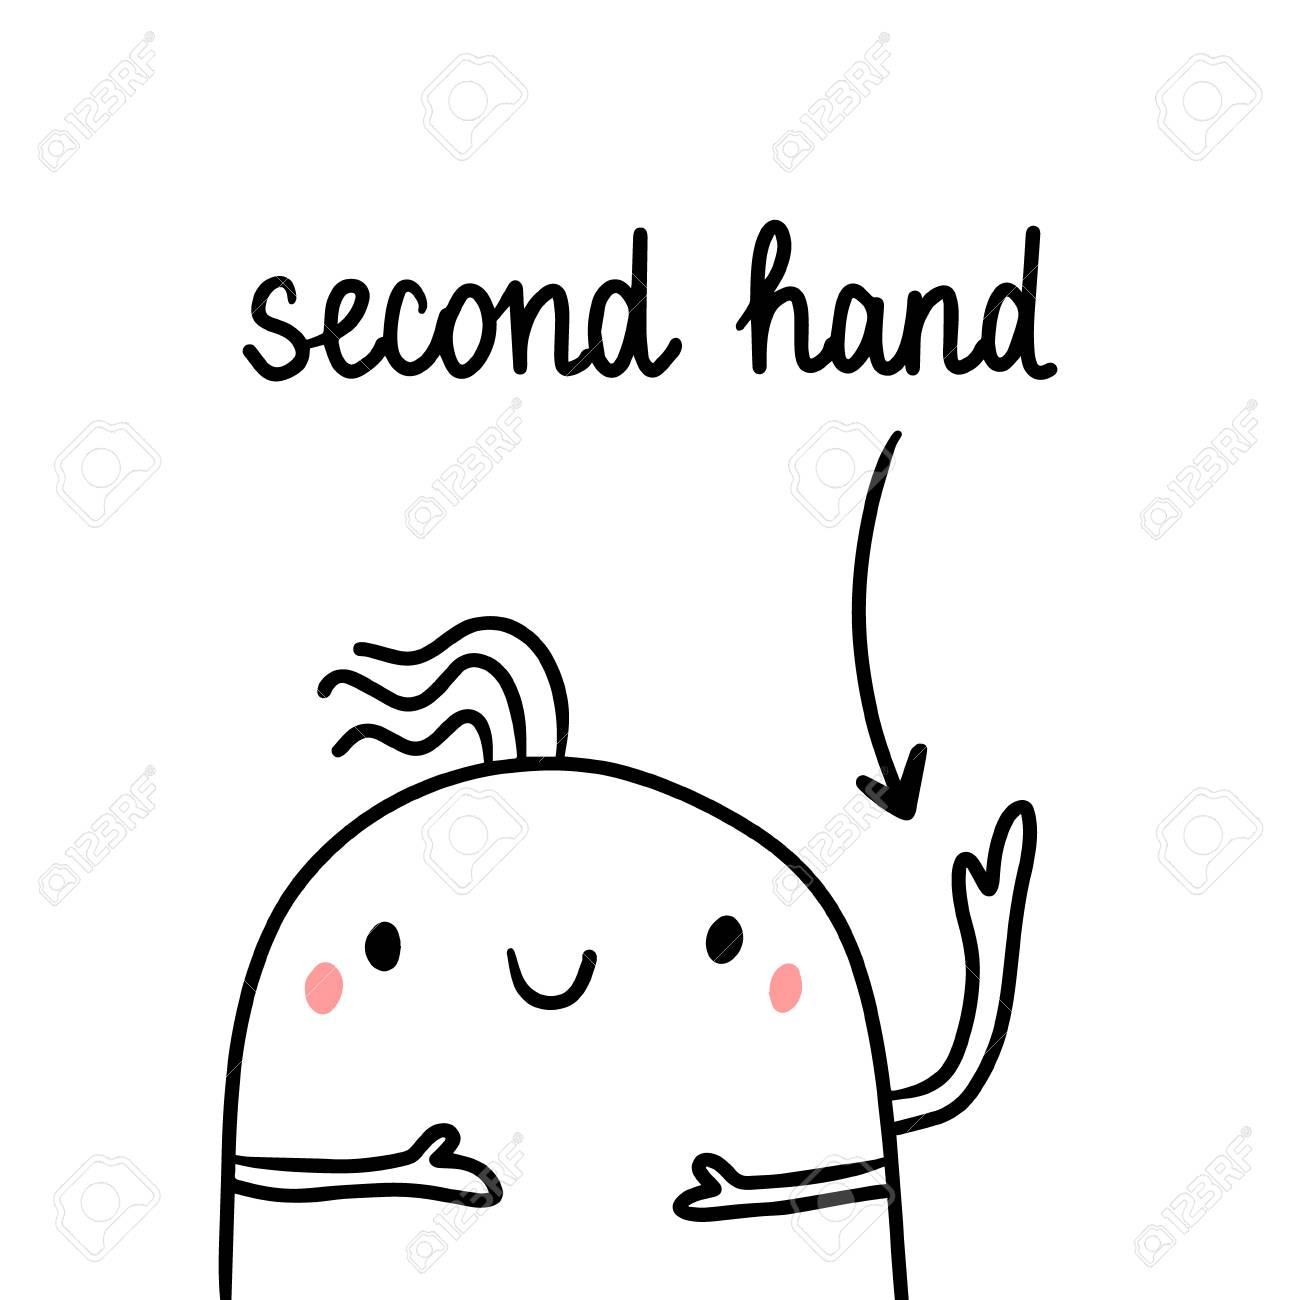 Second hand drawn illustration with cute marshmallow three arms cartoon minimalism - 124925668